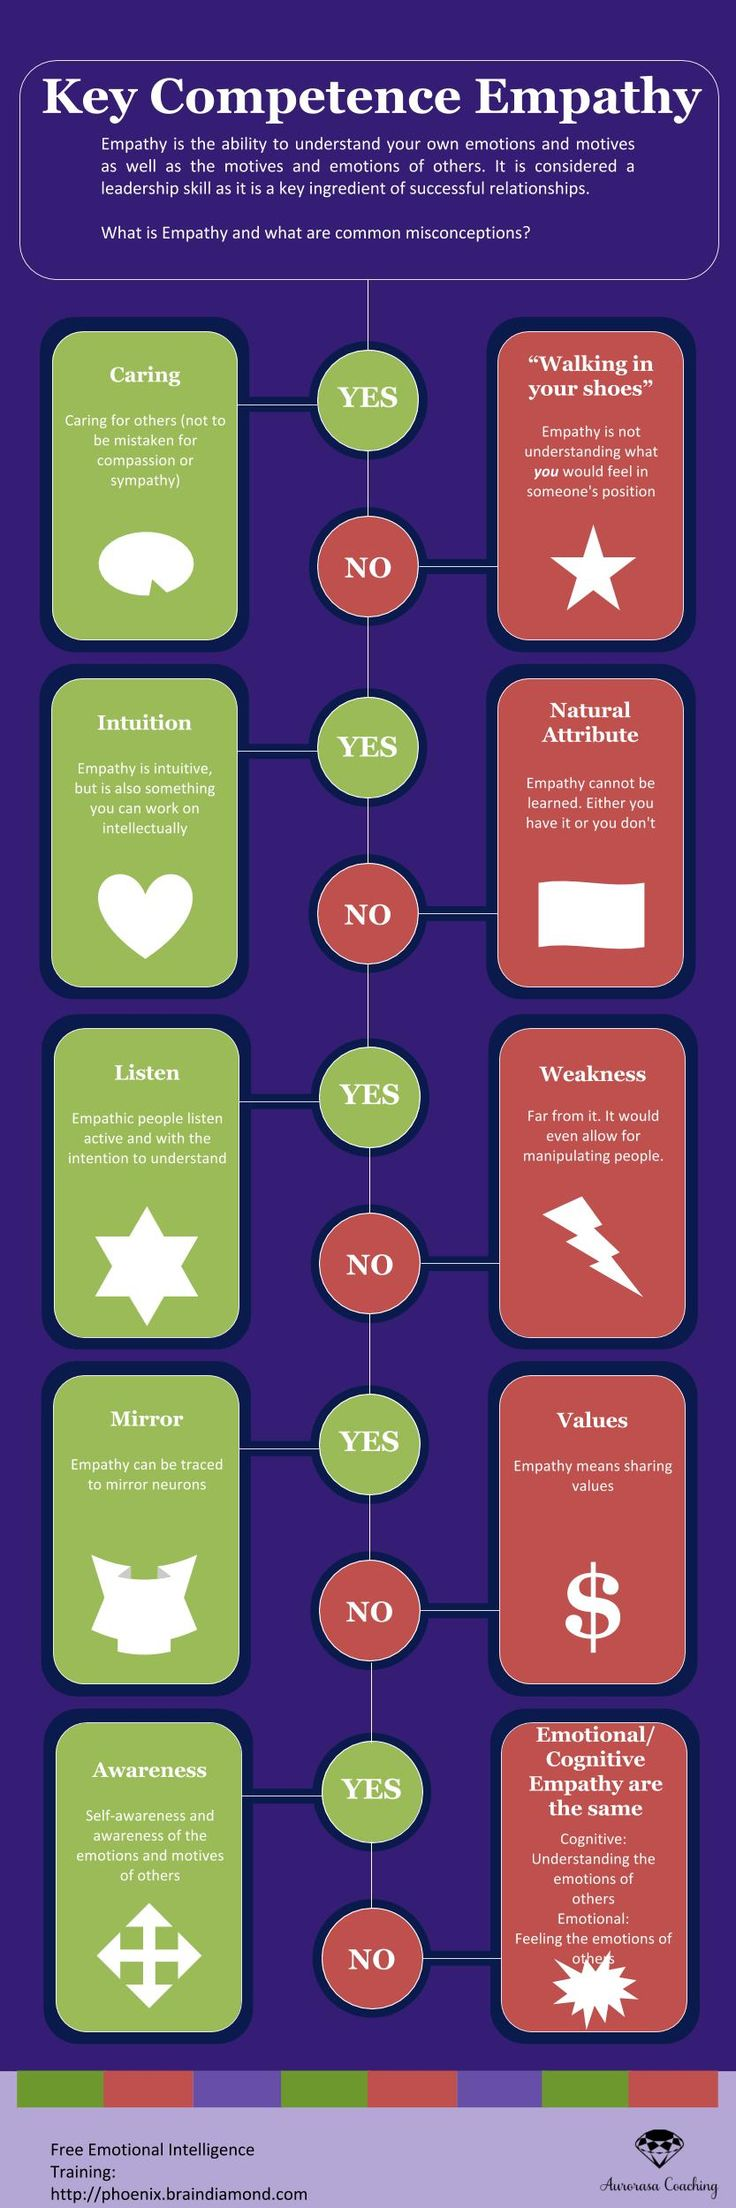 Psychology-Infographic-Emotional-Intelligence-Hub-5-Common-Misconceptions-about-Empathy-ei-hub.com Psychology Infographic : Emotional Intelligence Hub - 5 Common Misconceptions about Empathy ei-hub.com/.....